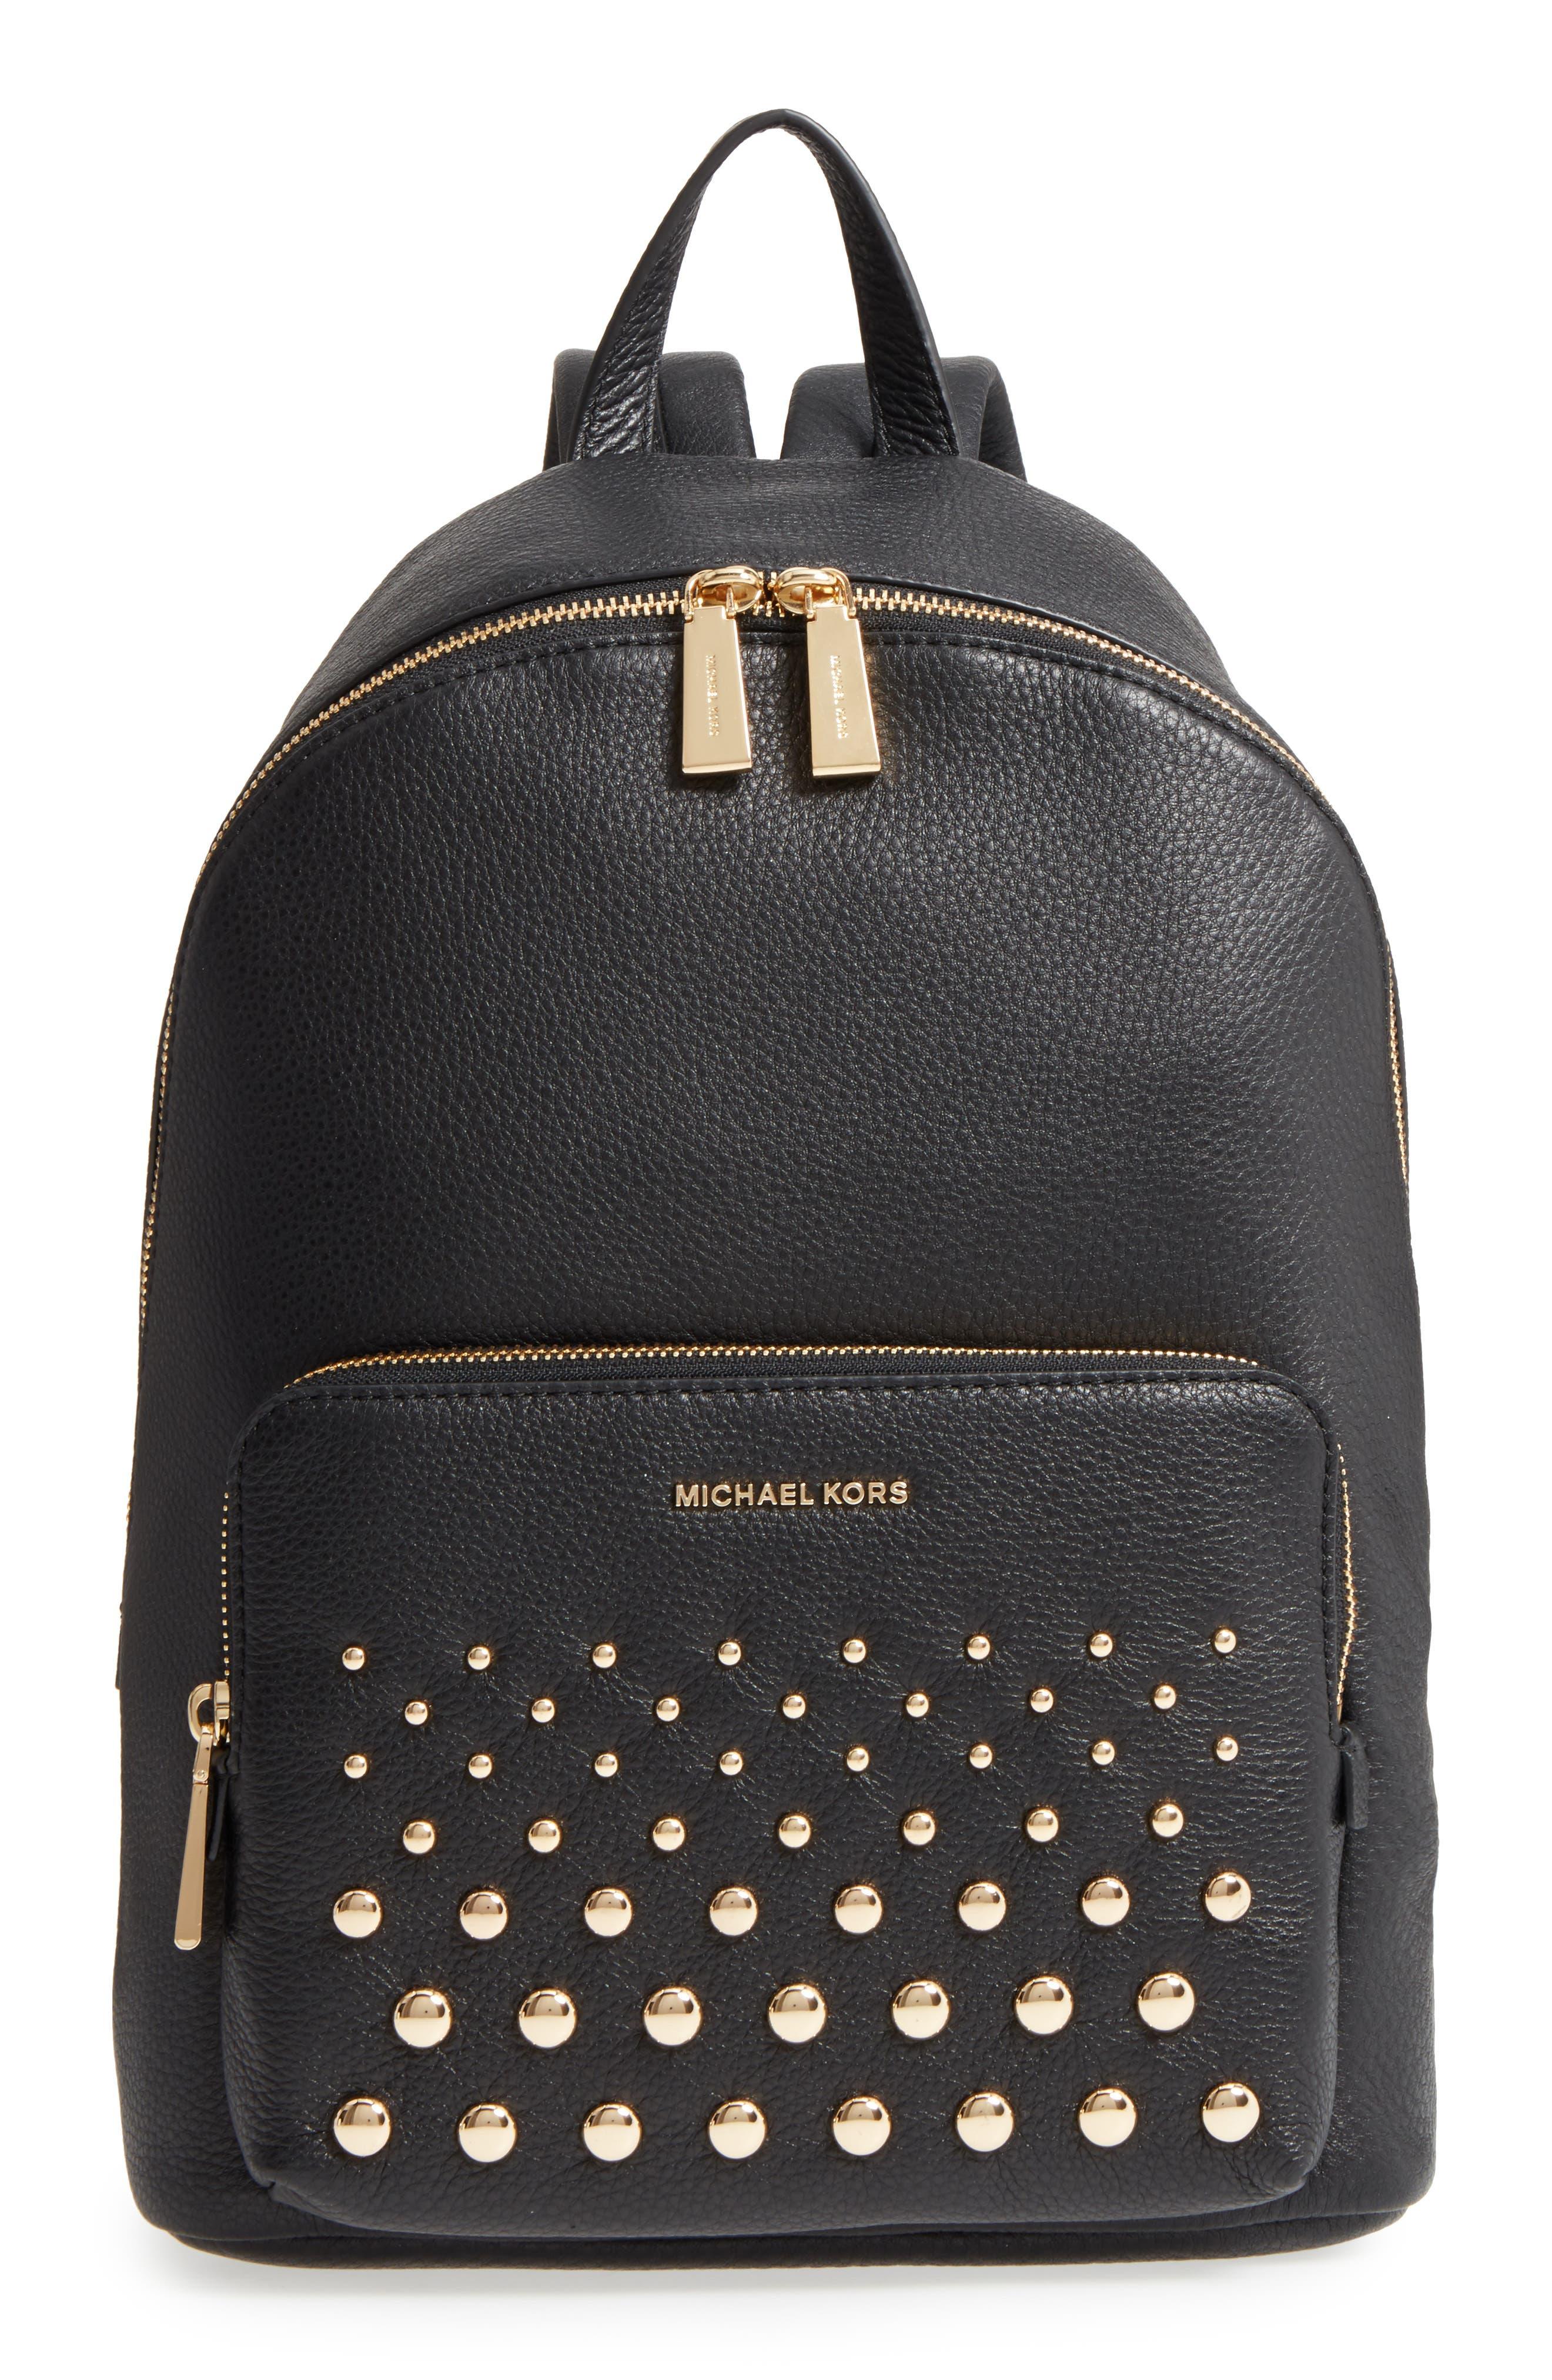 Alternate Image 1 Selected - Michael Kors Large Wythe Studded Leather Backpack